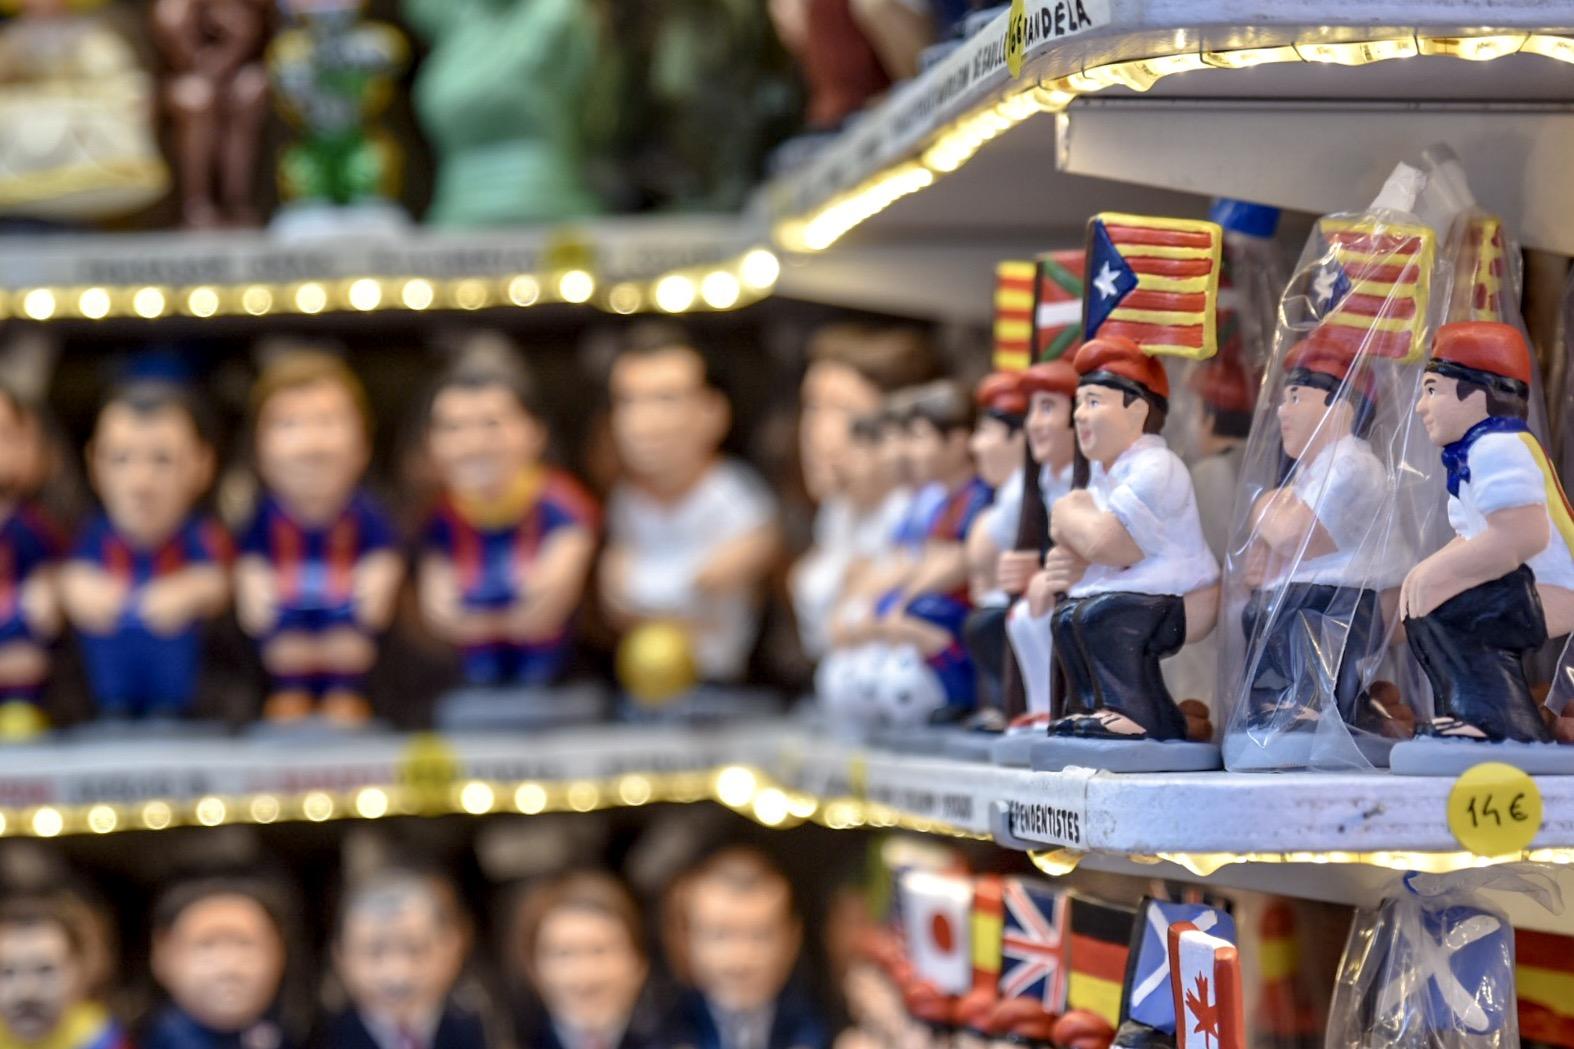 El Caganer - Catalan Christmas shitting figurine